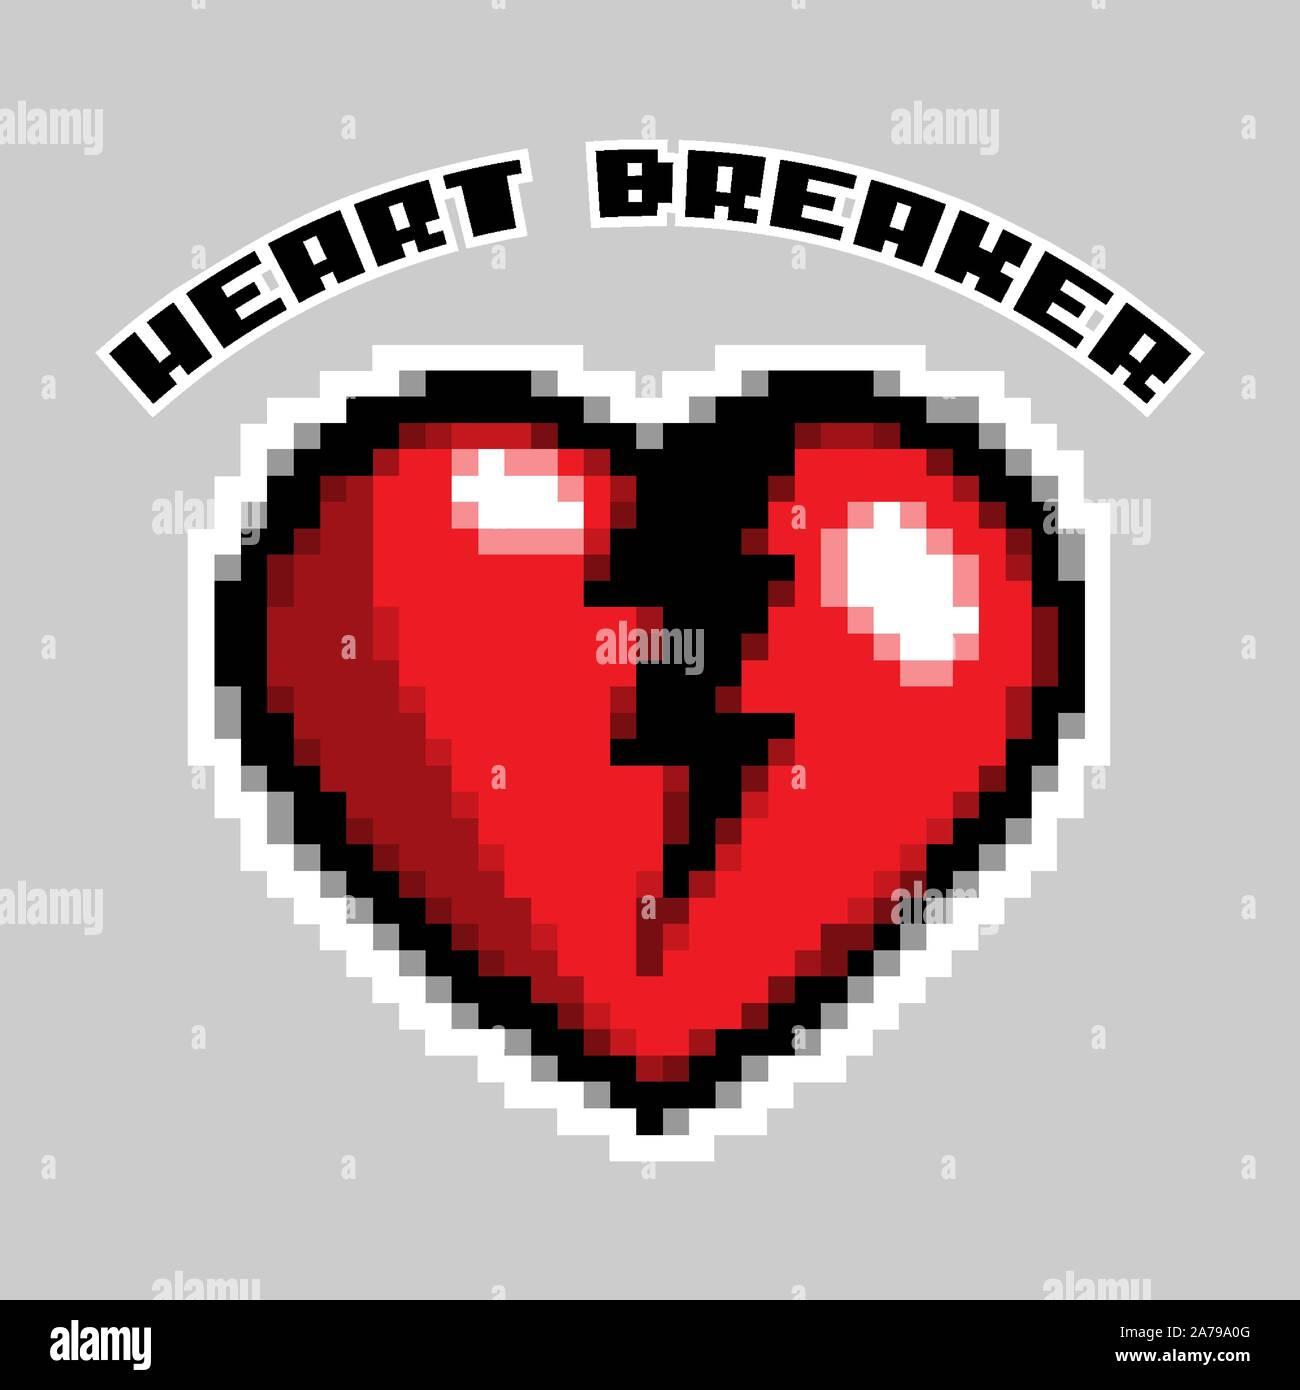 Pixel Art Heart Breaker Love And Valentine Vector Illustration Stock Vector Image Art Alamy